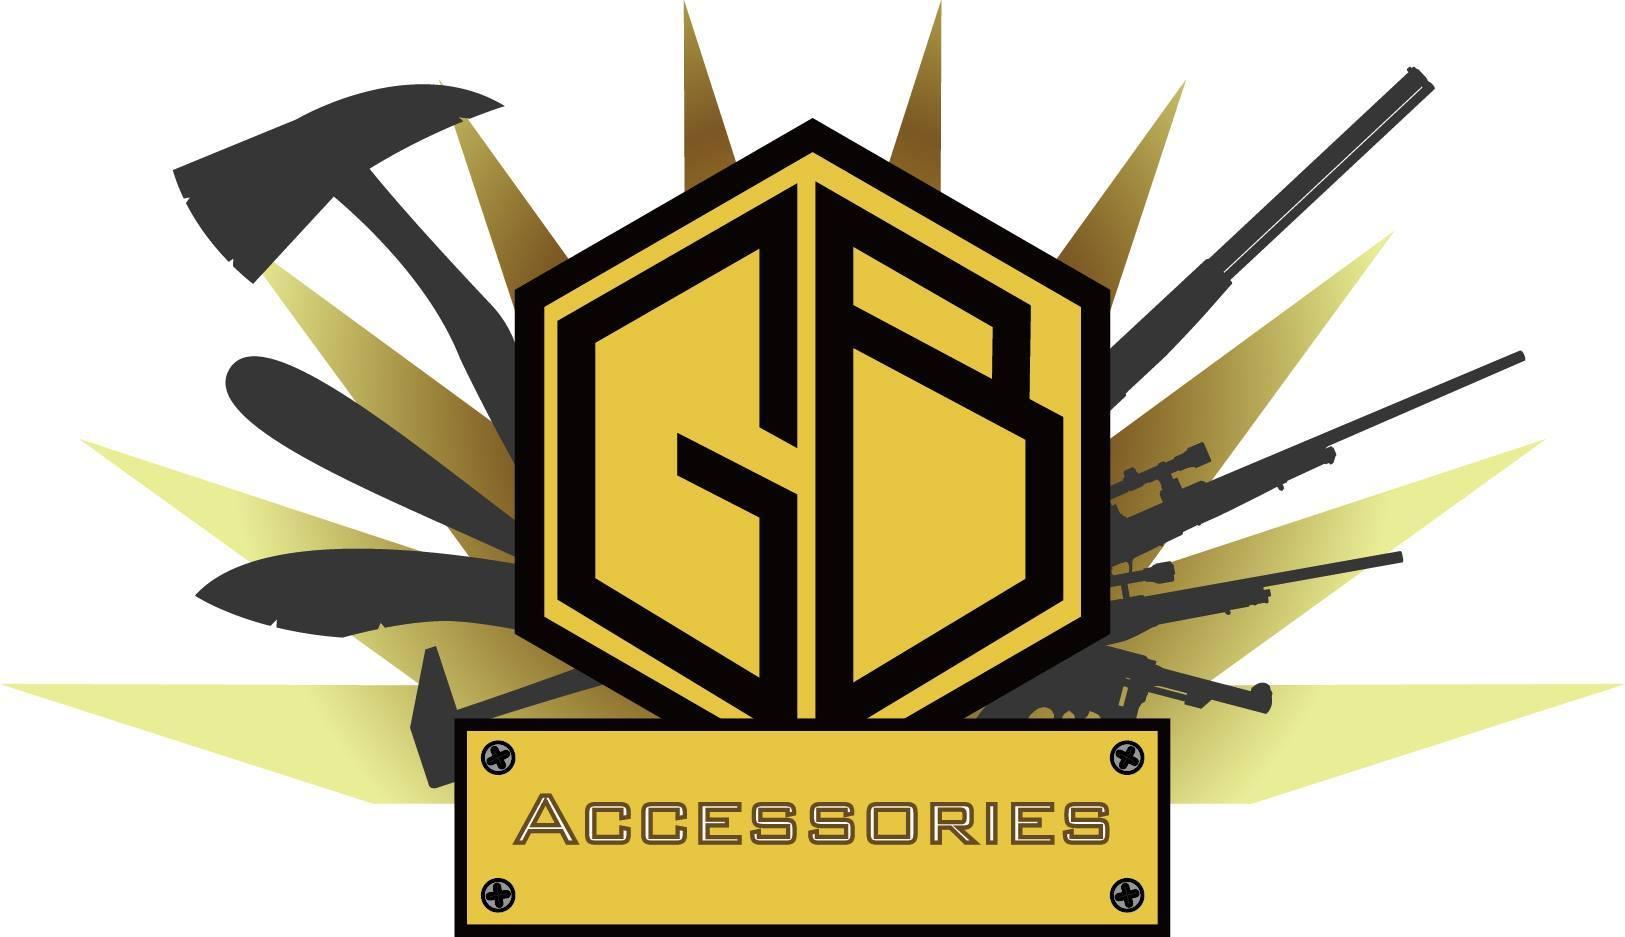 GB Accessories